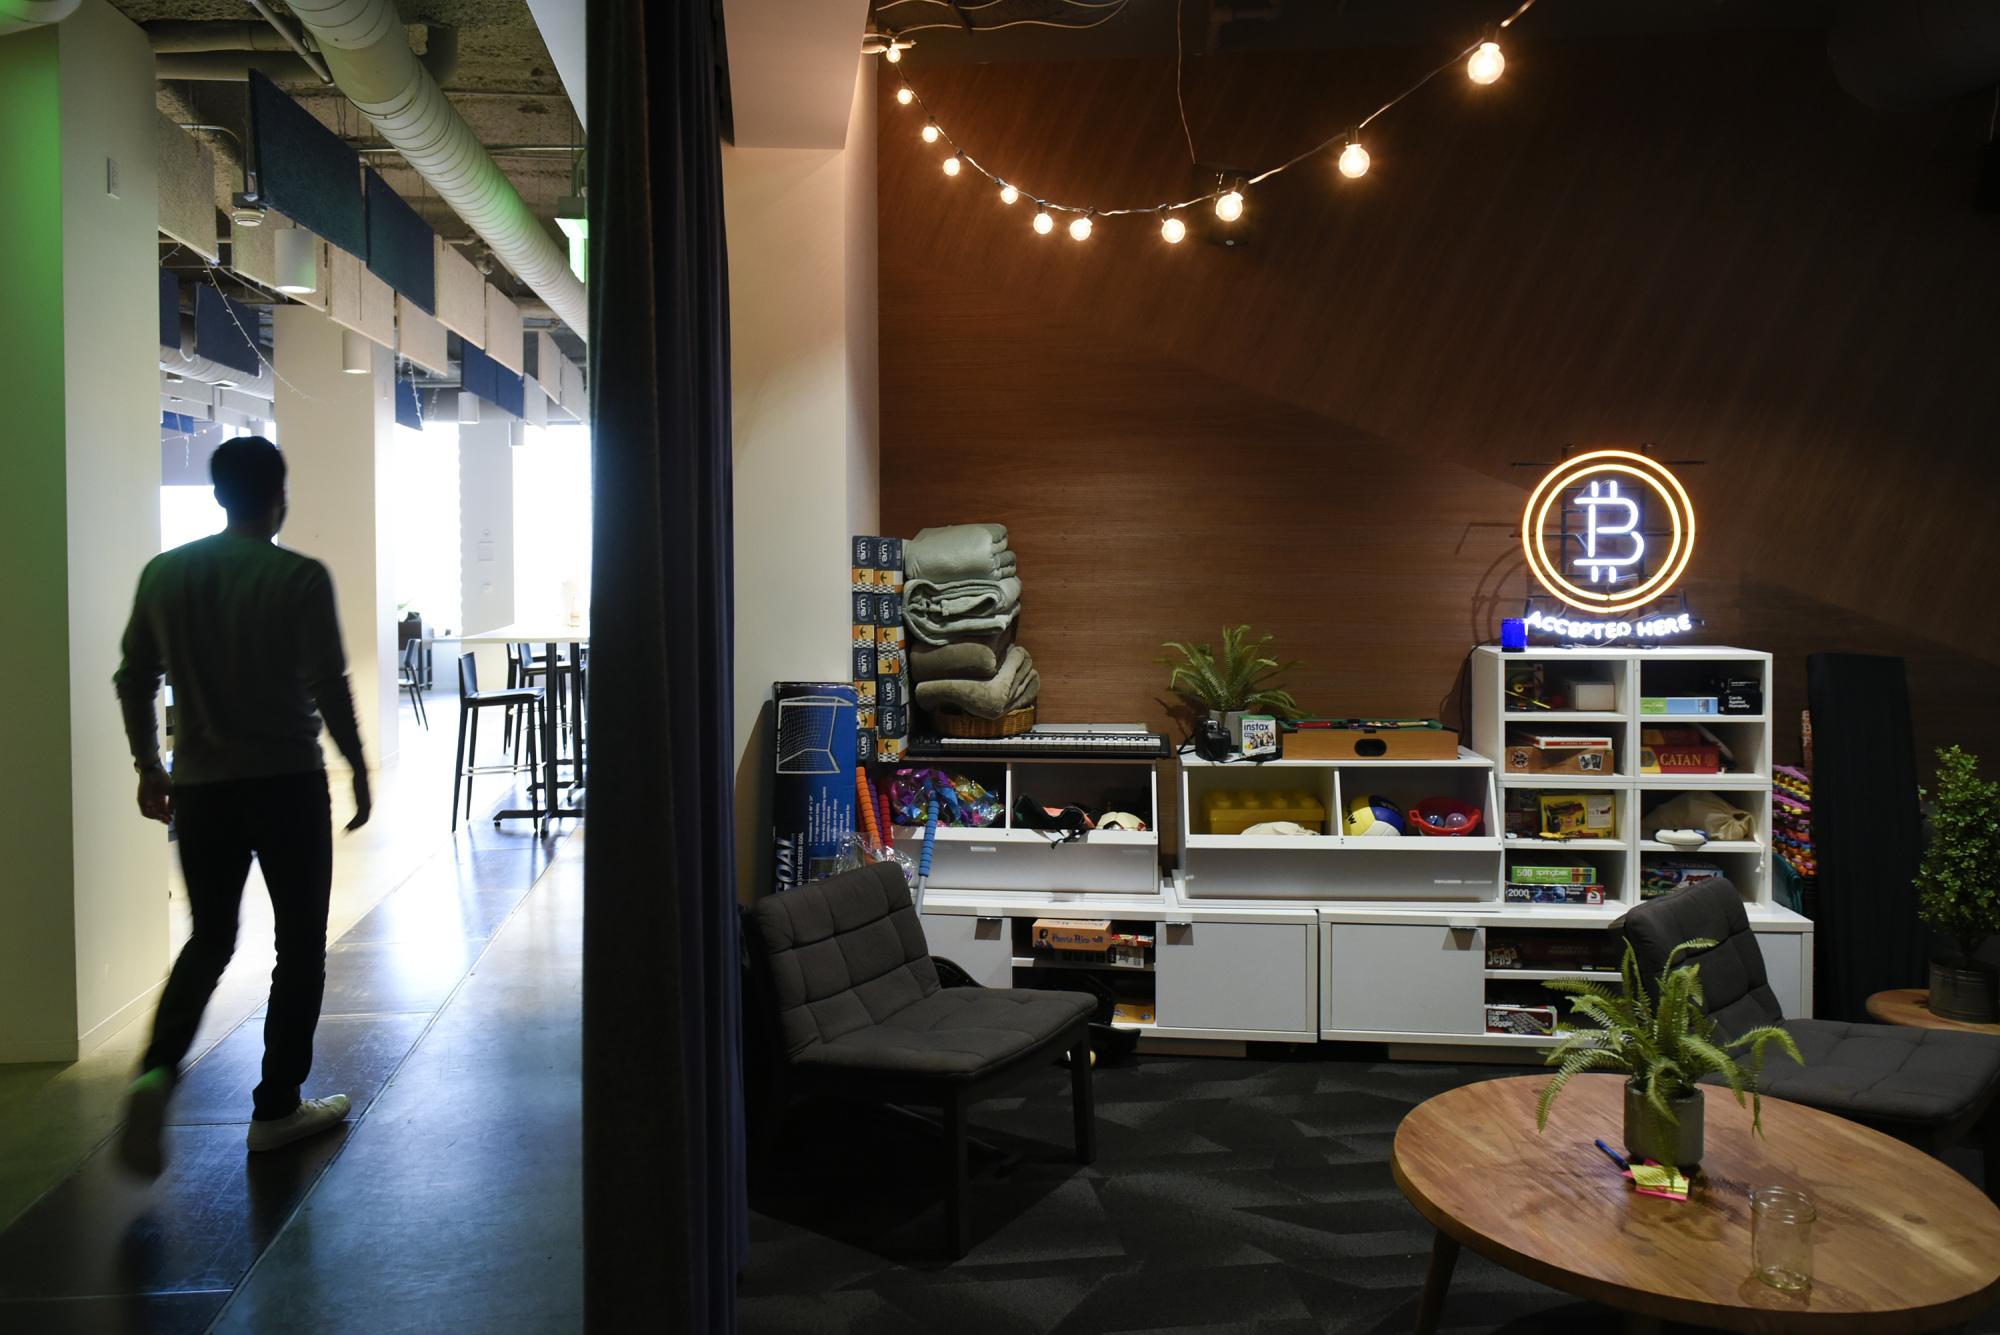 Coinbase office in San Francisco.